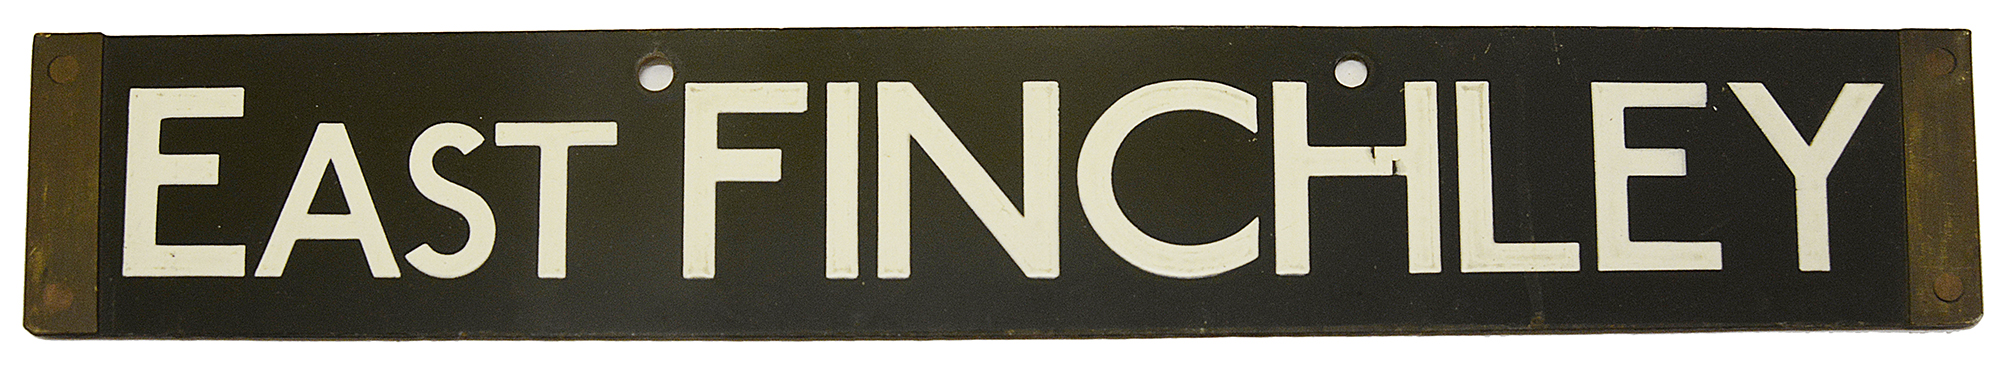 A London Underground Standard Tube Stock enamel cab destination plate - Image 3 of 3